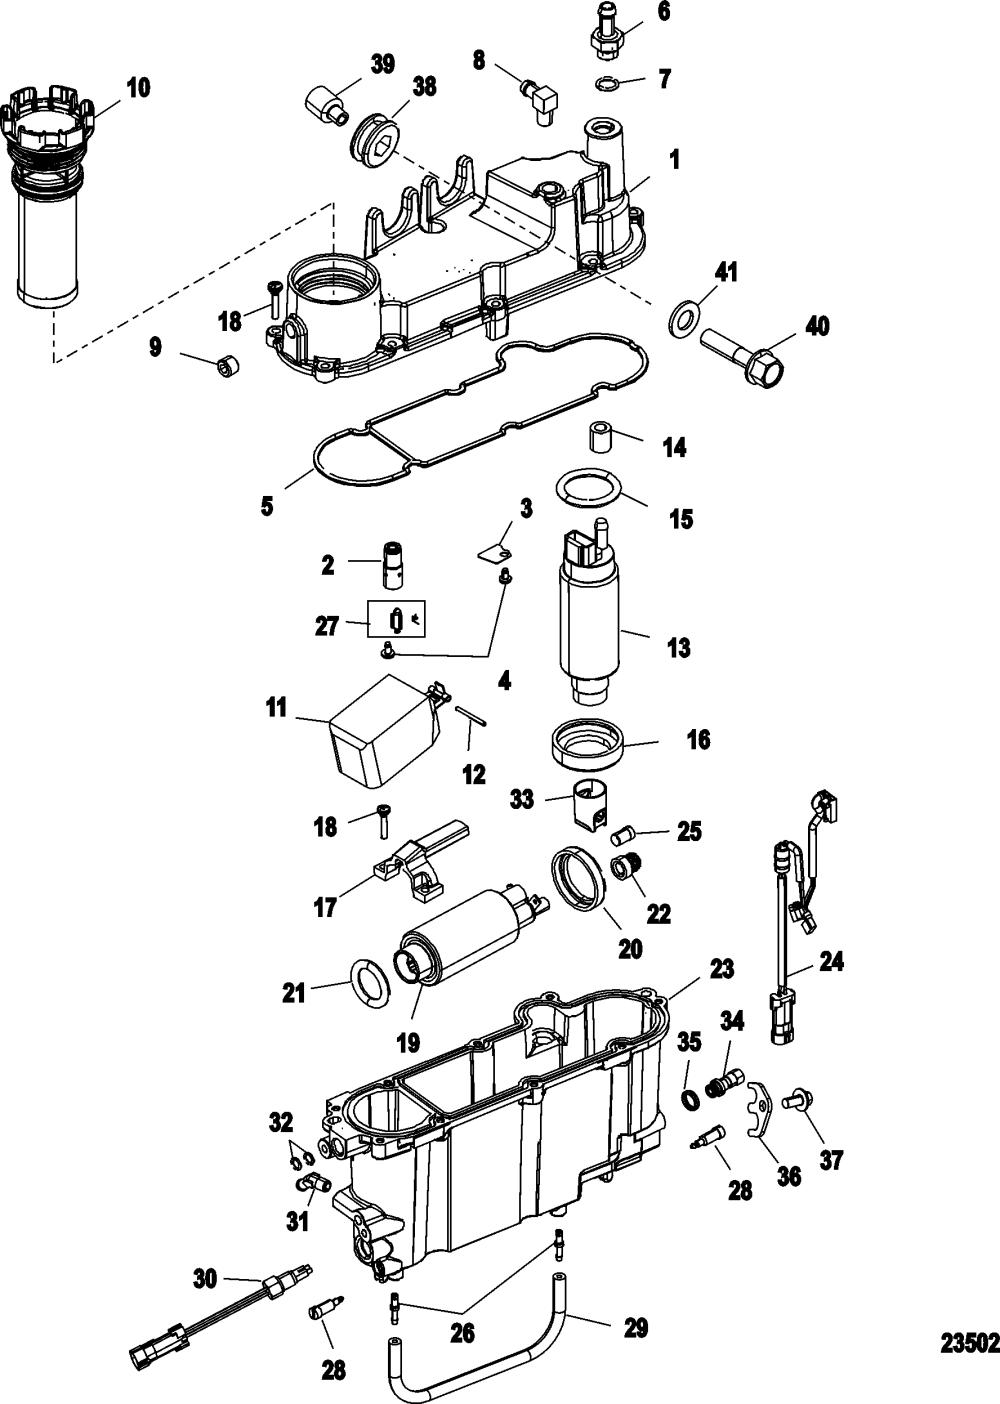 medium resolution of mercury fuel pump diagram data diagram schematicmercury fuel pump diagram wiring diagram datasource mercury outboard fuel